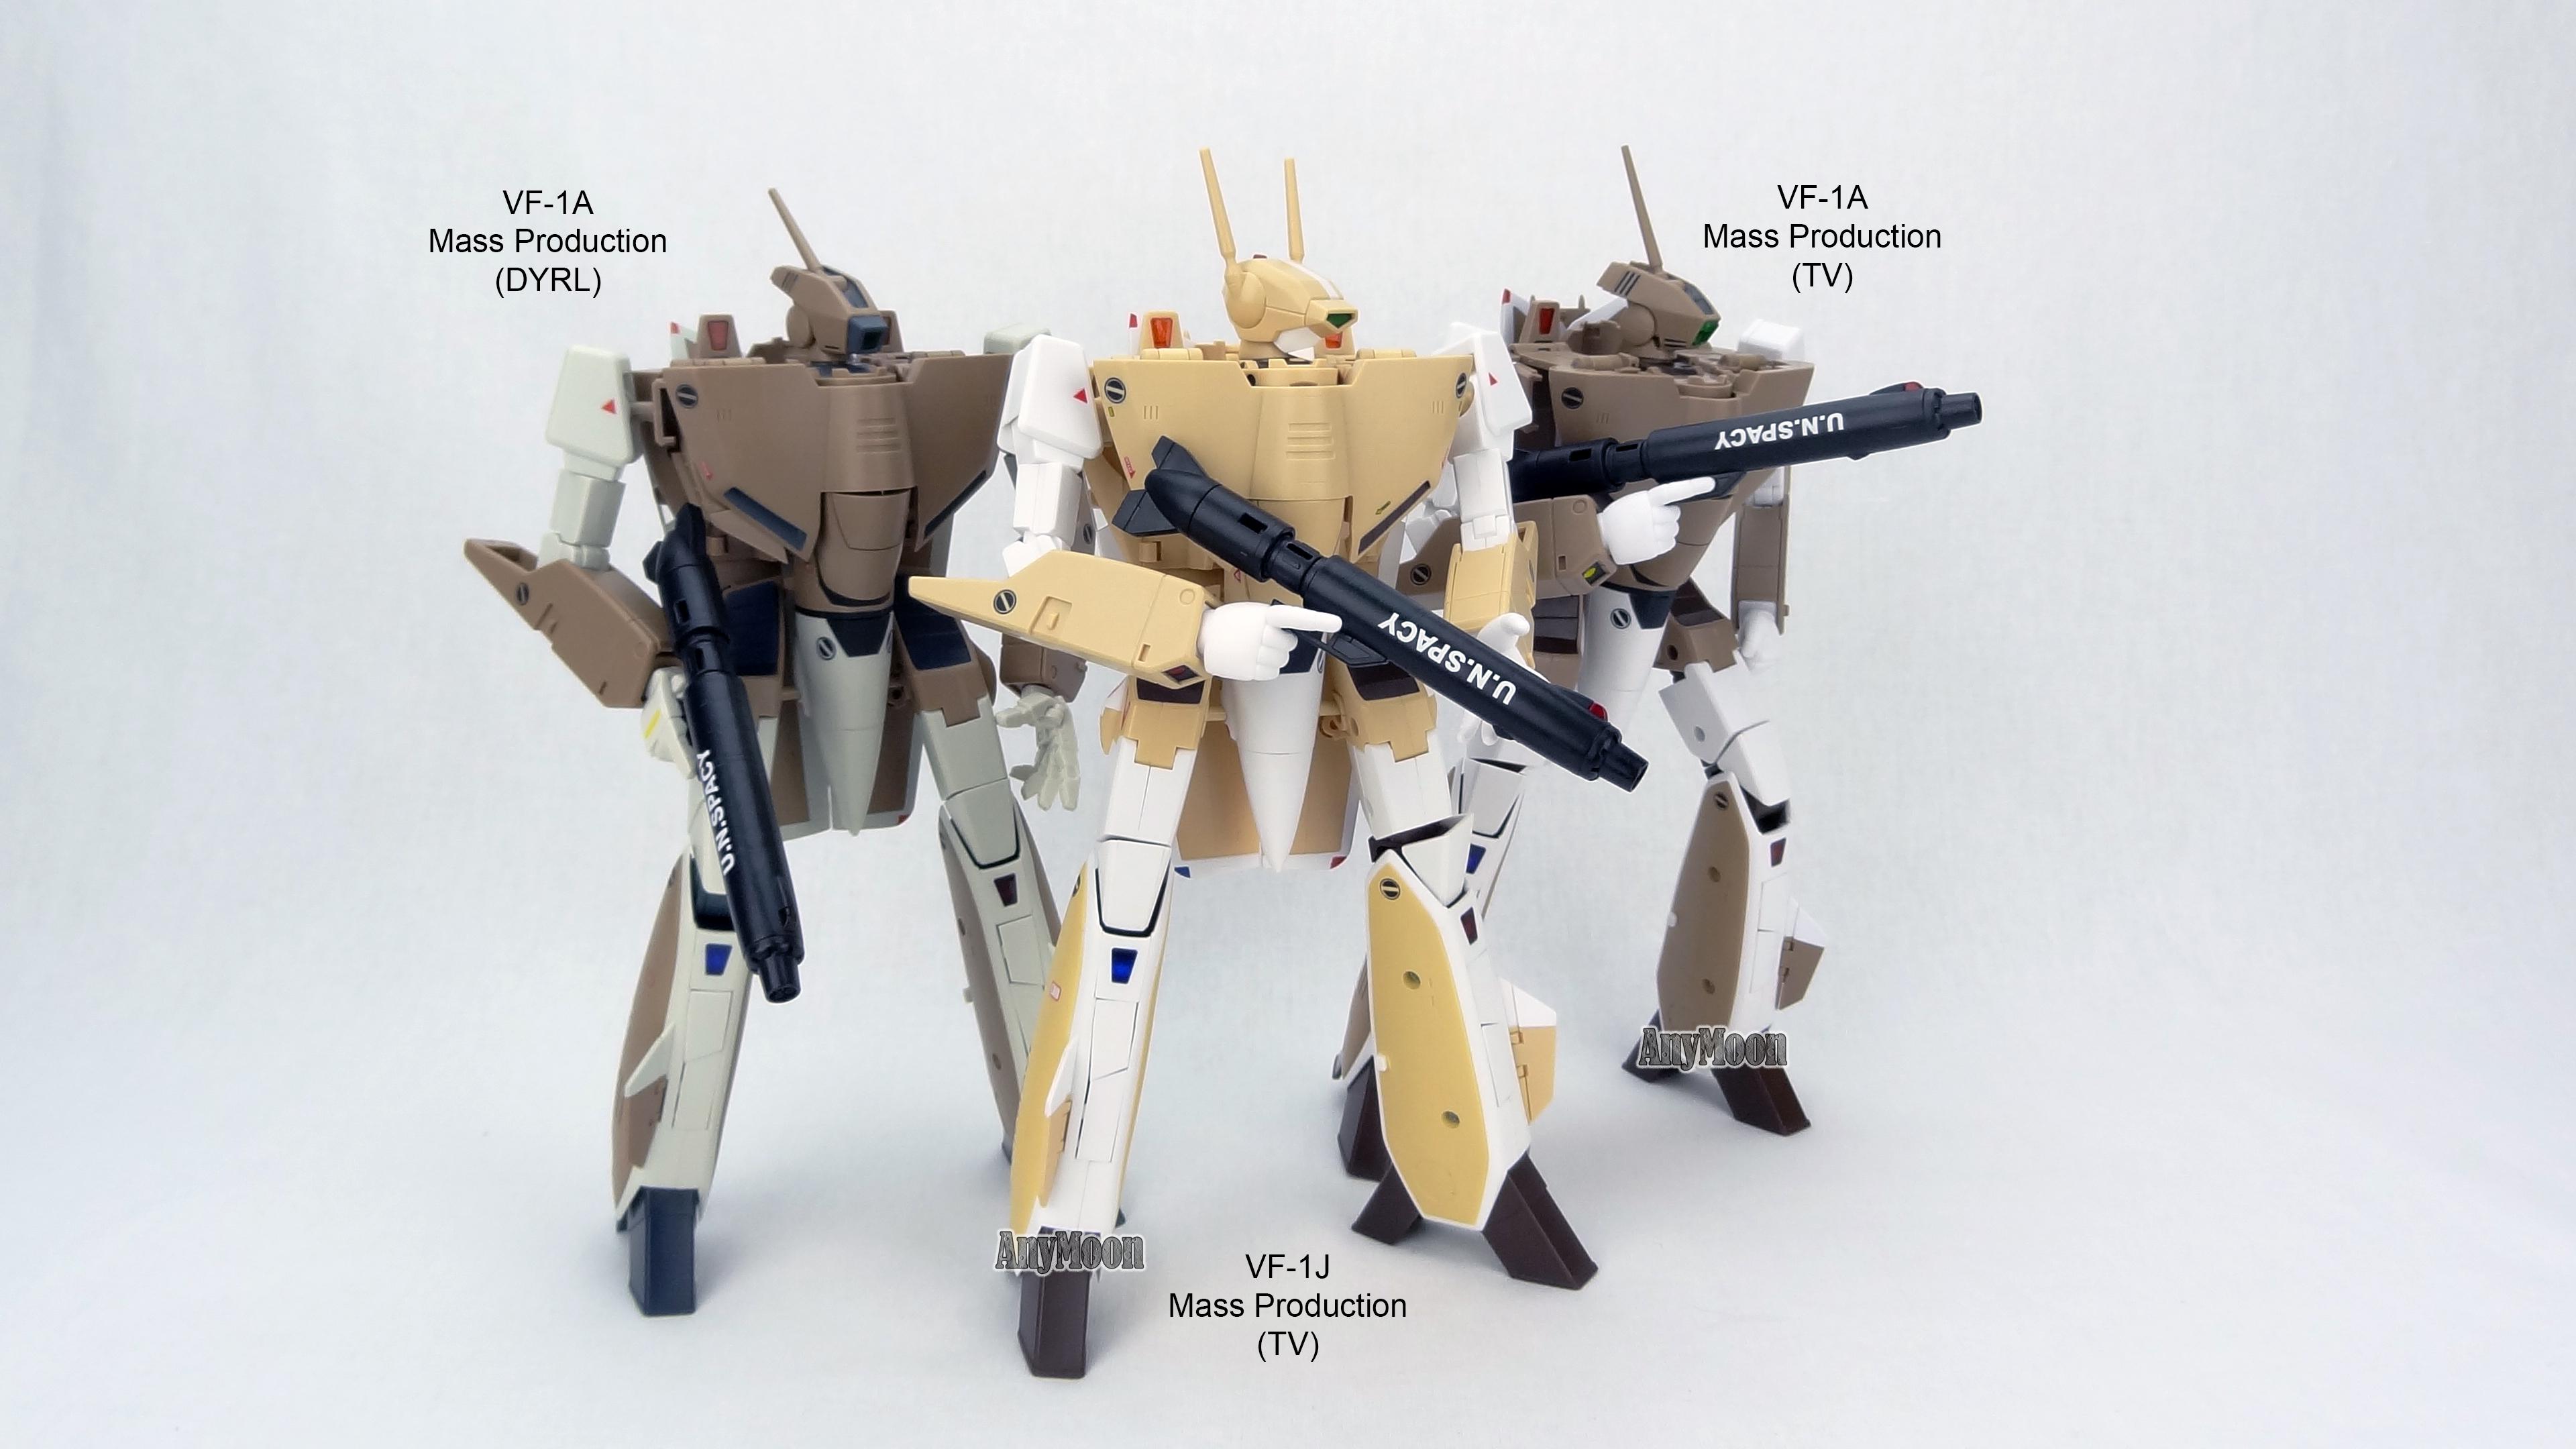 15-Yamato-V2-VF-1J-Mass-Production-7.jpg